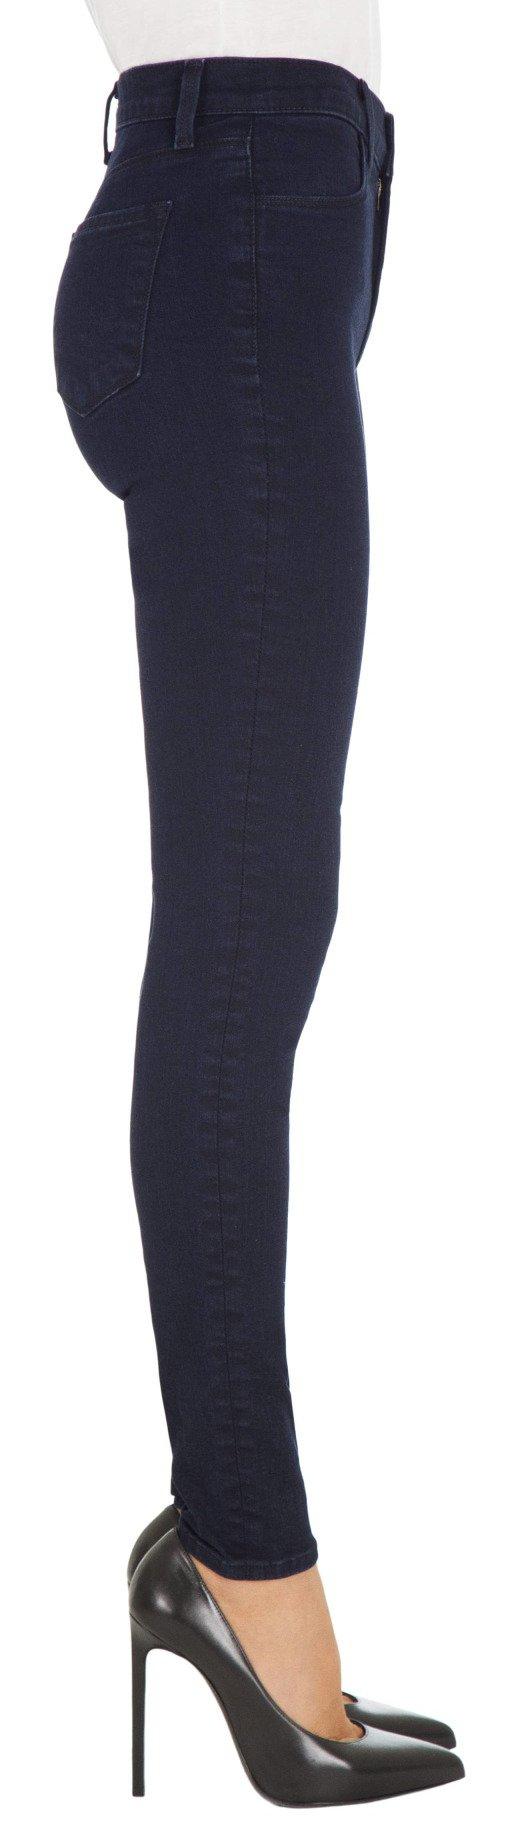 J Brand Jeans Women's 23110 Maria High Rise Skinny Jean, Bluebird, 28